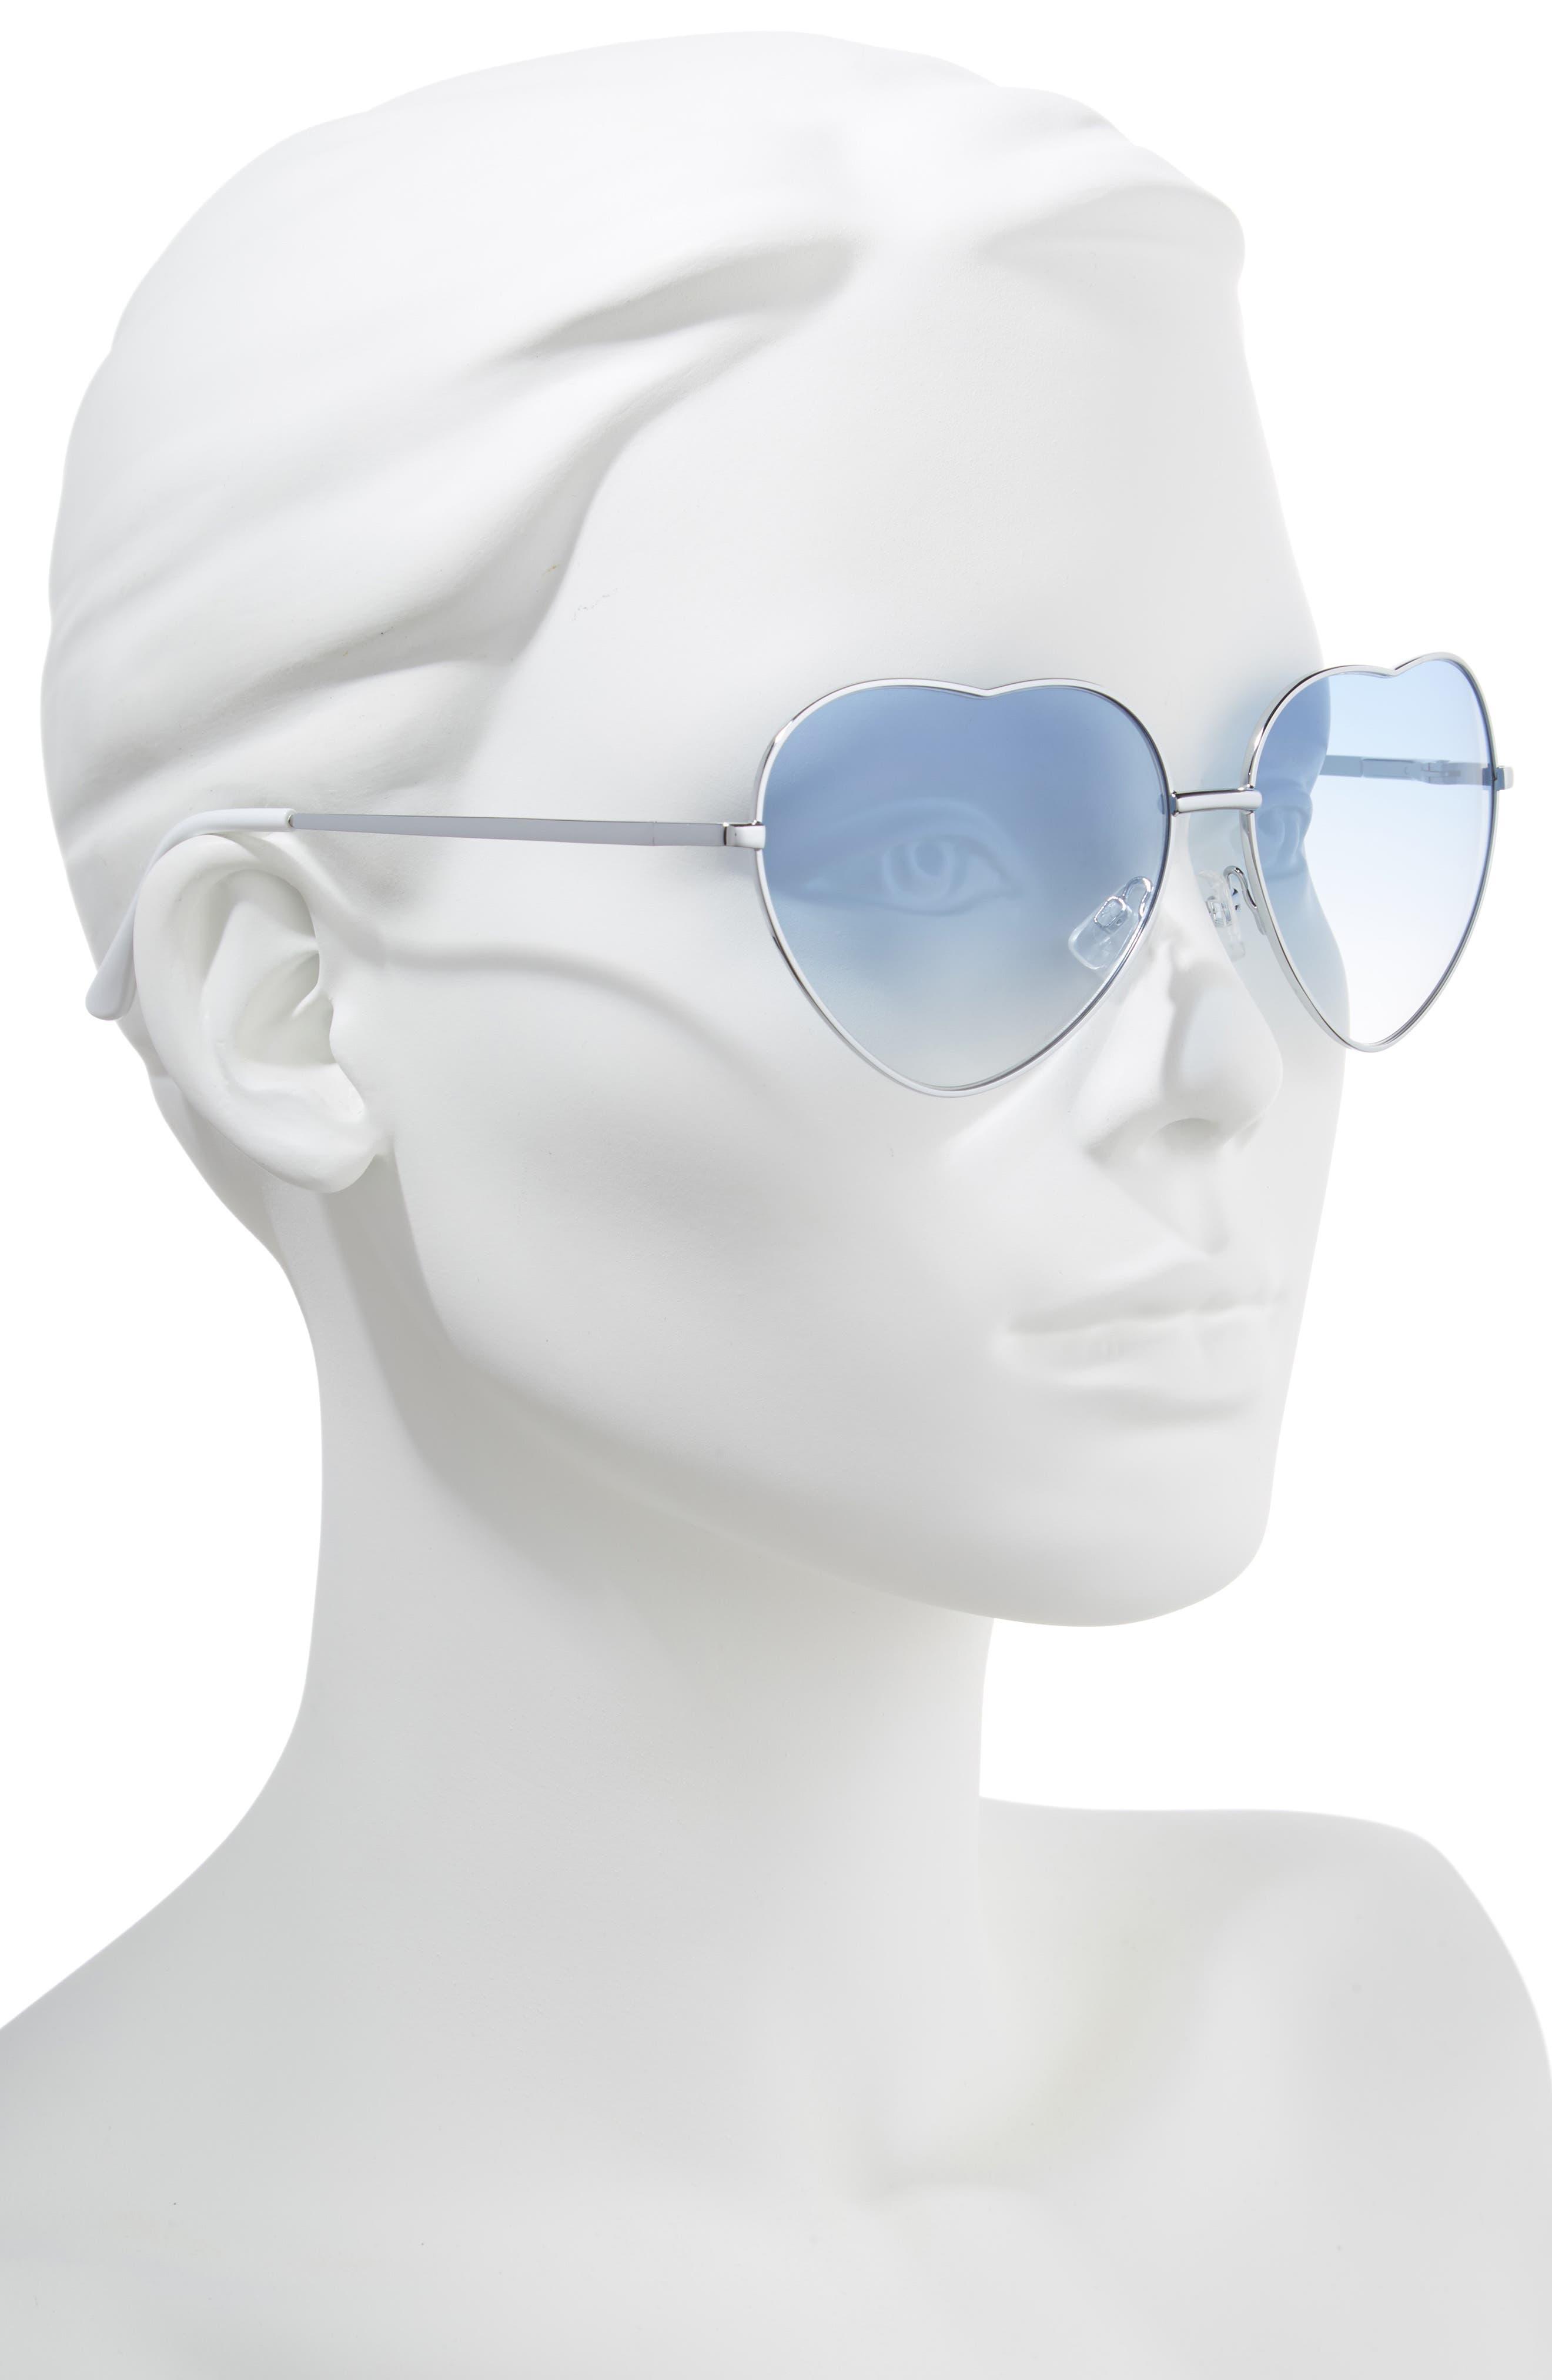 60mm Metal Heart Sunglasses,                             Alternate thumbnail 2, color,                             040